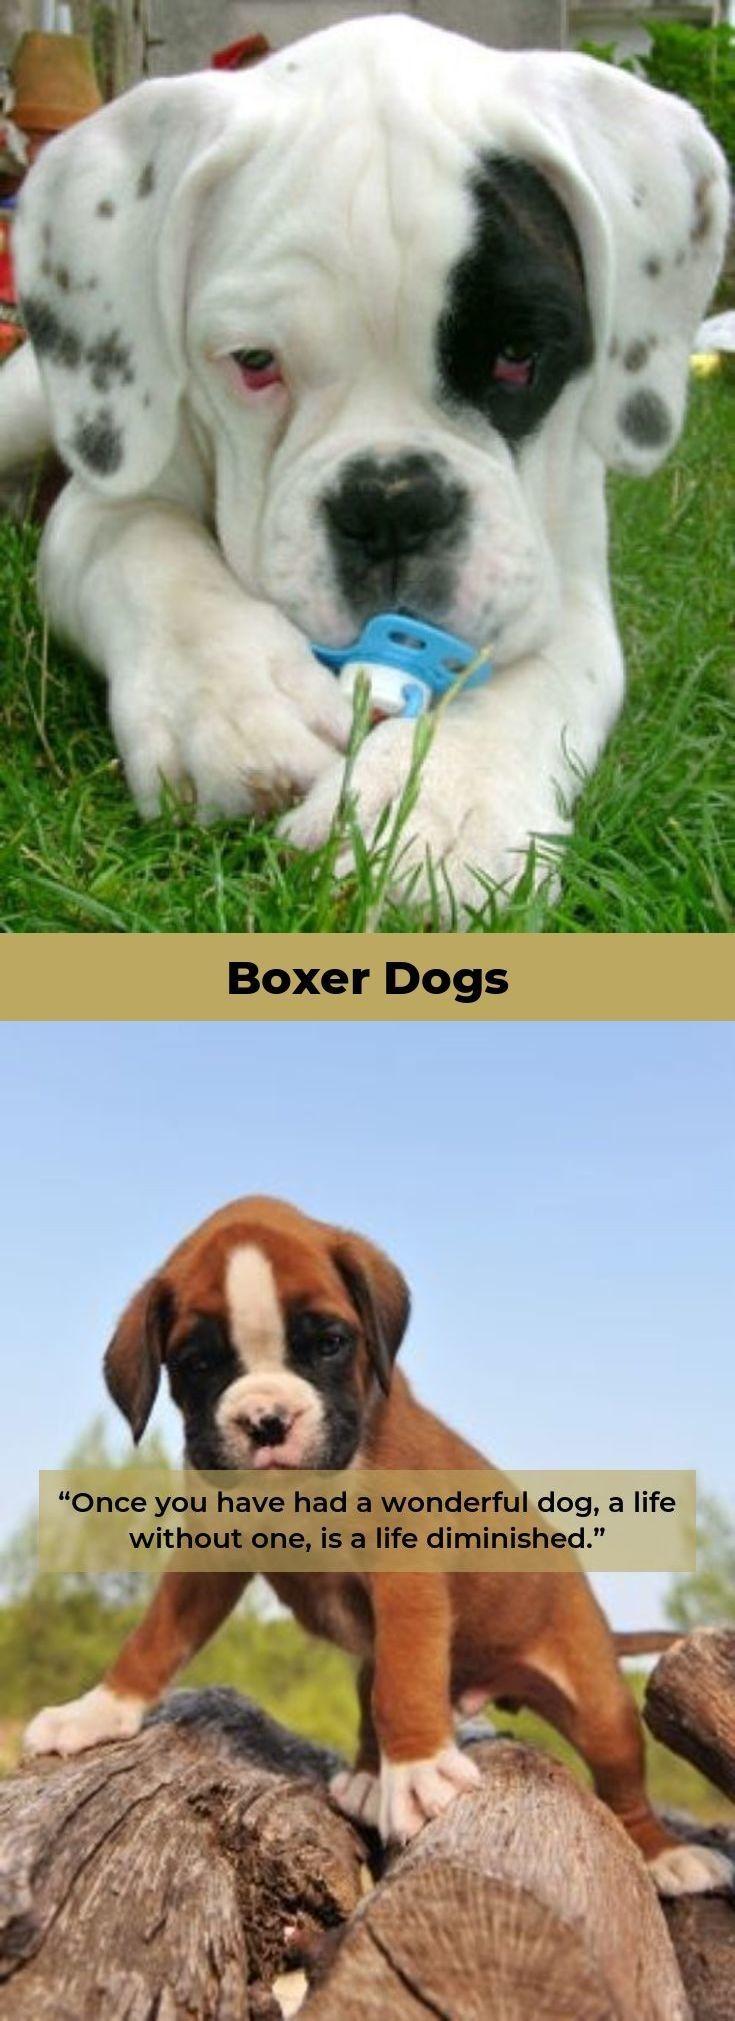 Boxerdog Boxerdogsoninstagram Boxer Puppies Boxer Dogs Boxer Puppy